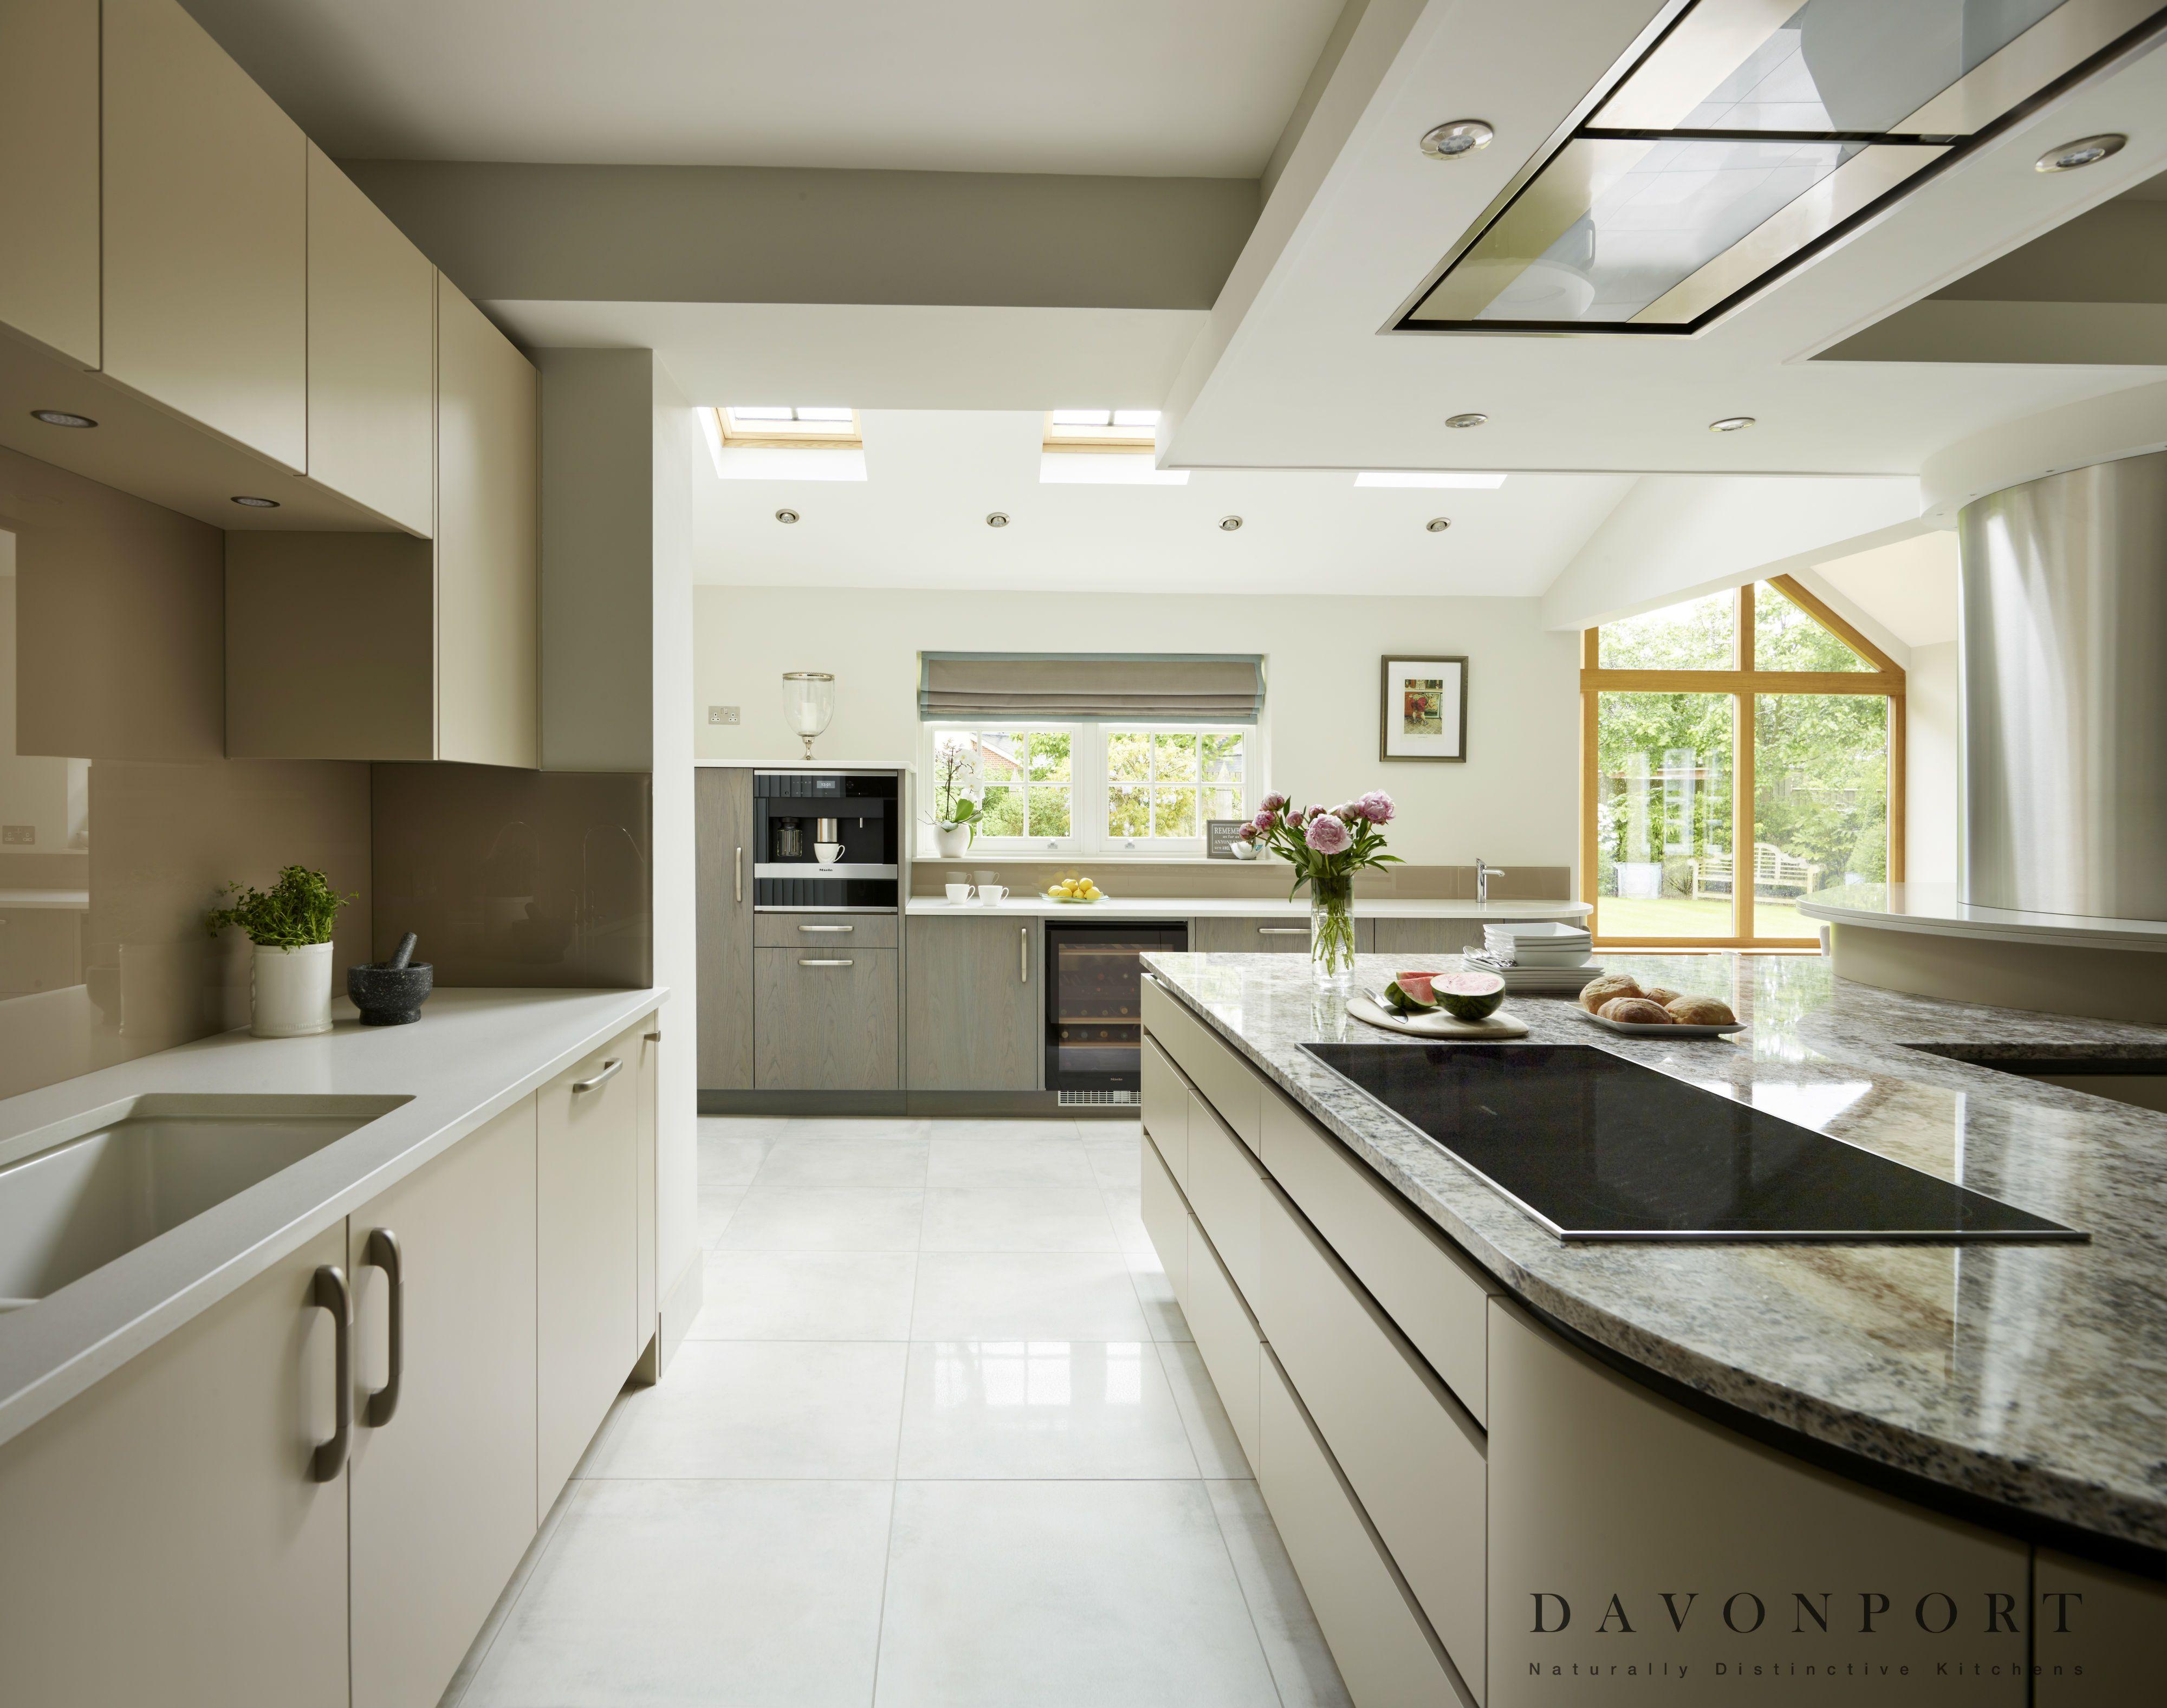 Kitchen Designs Kitchen design, Free kitchen design